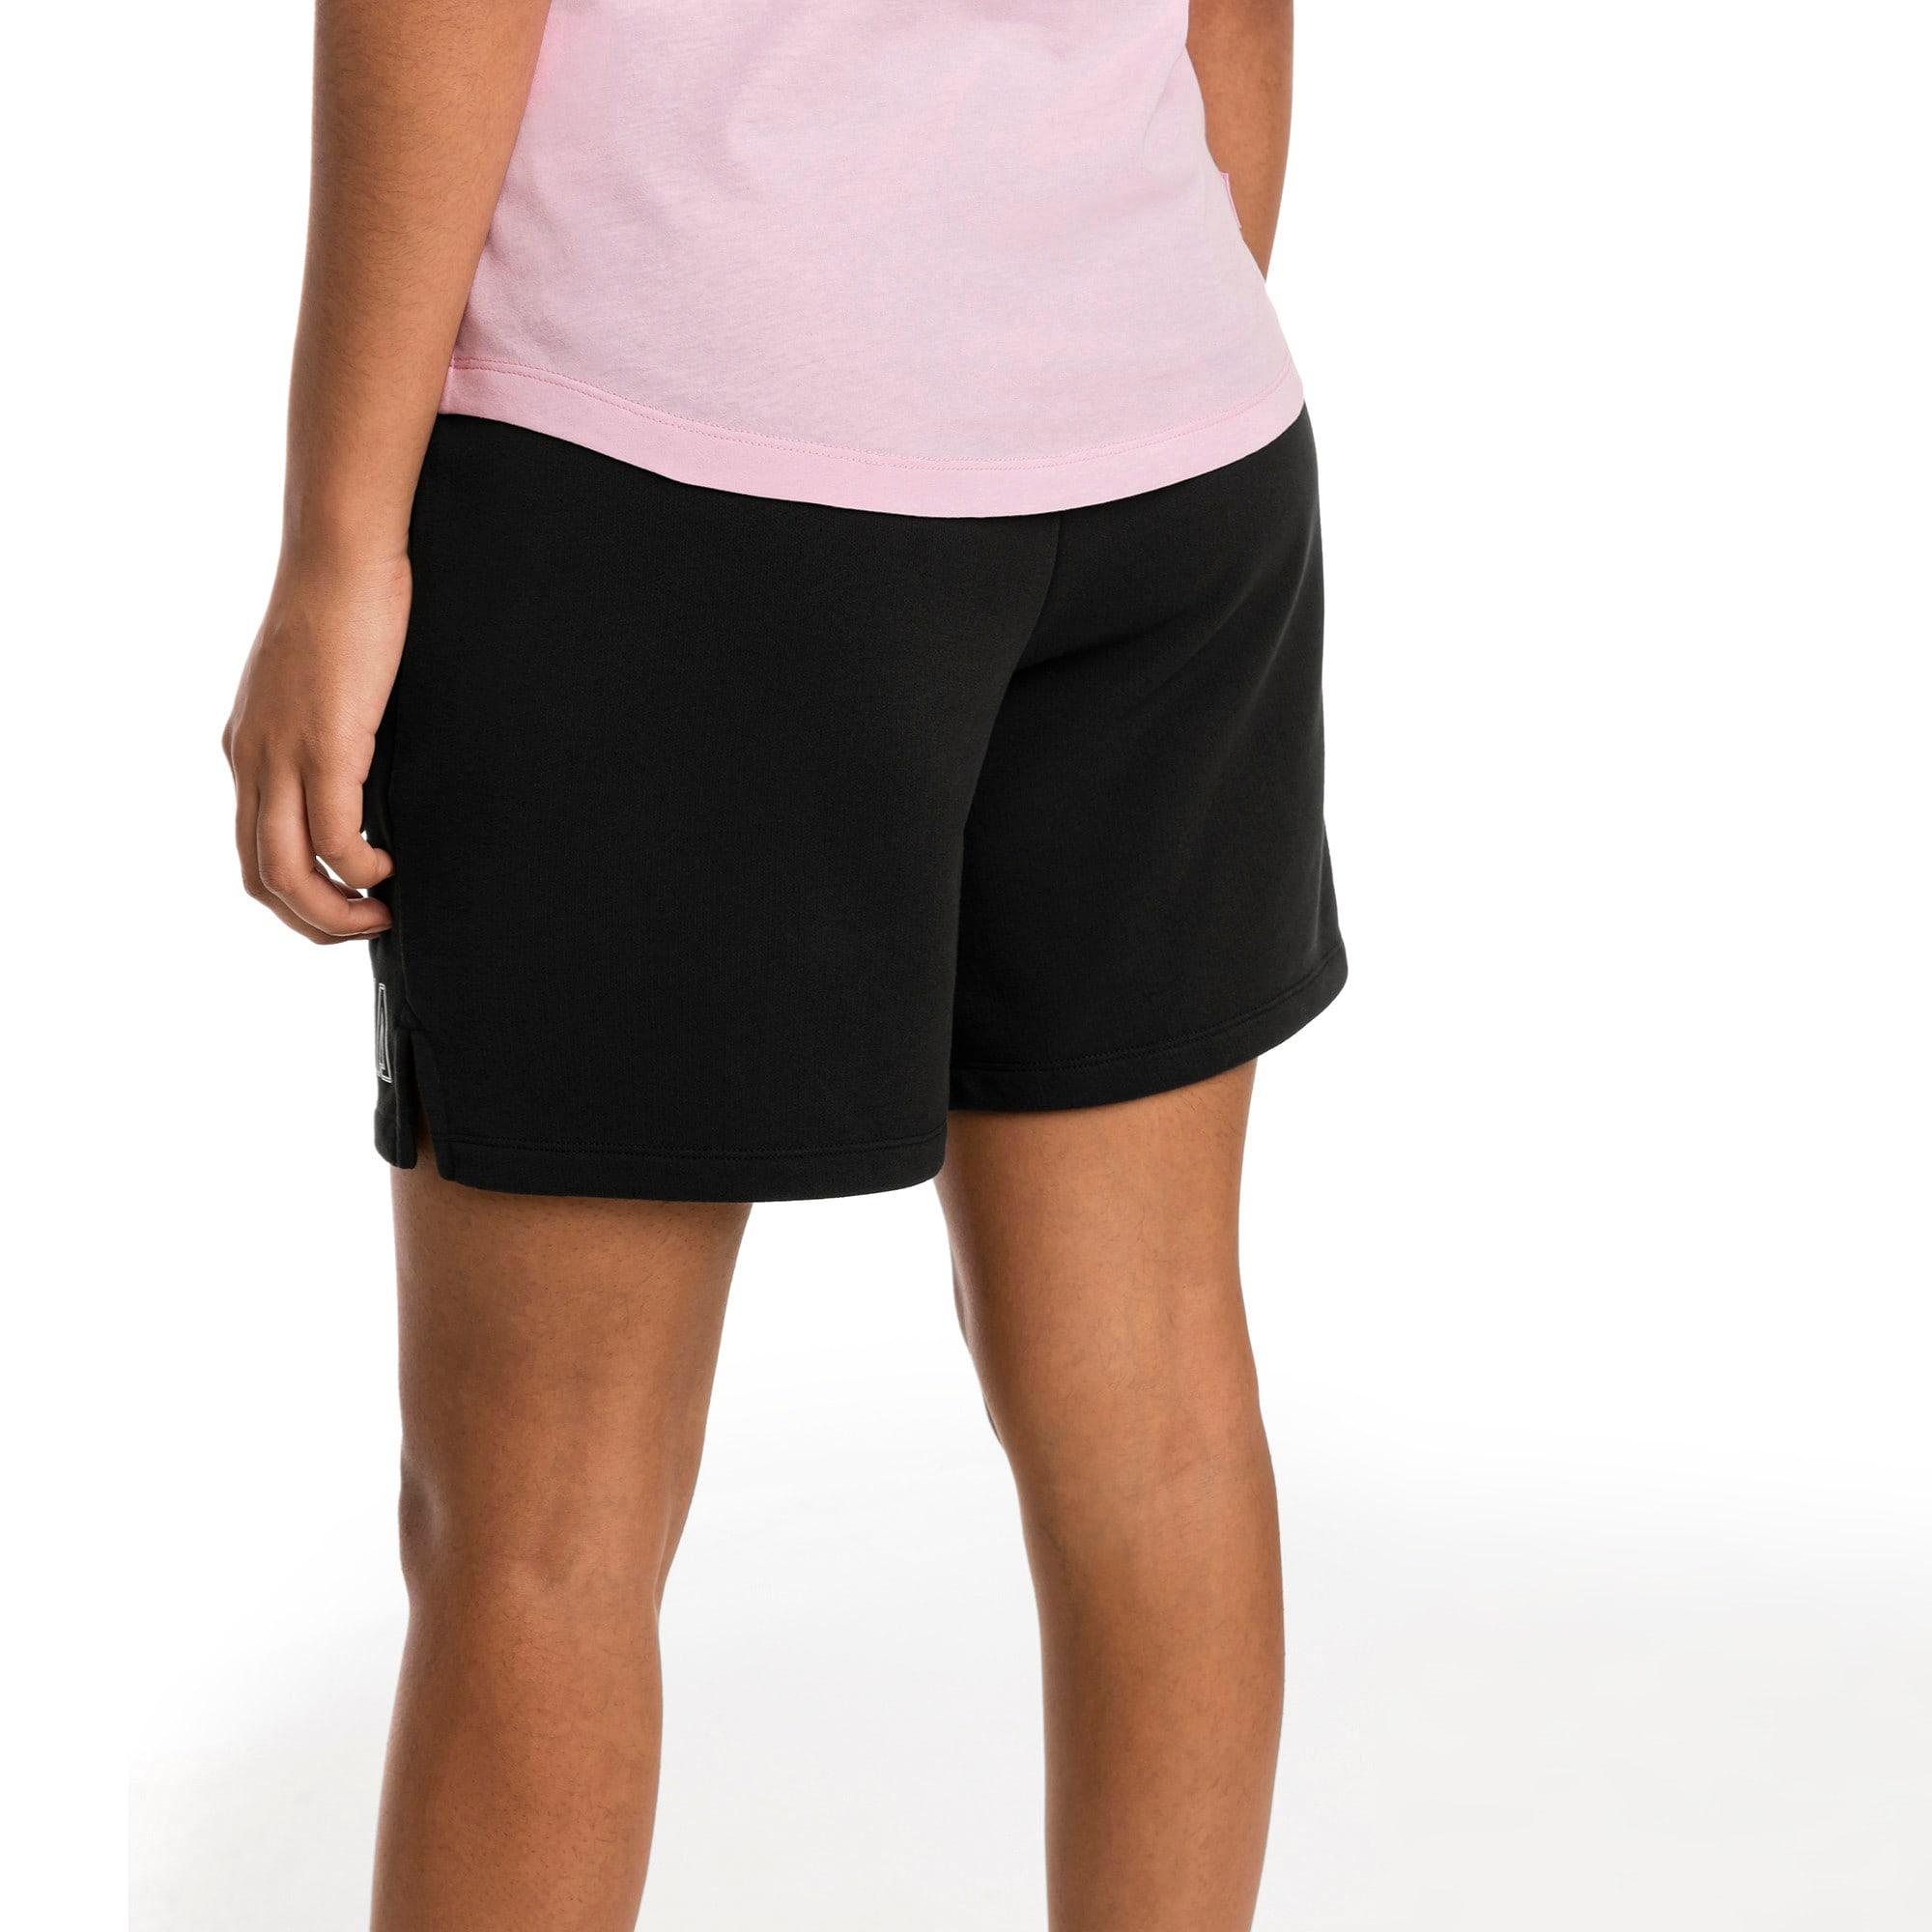 Thumbnail 2 of Athletics Women's Sweat Shorts, Puma Black, medium